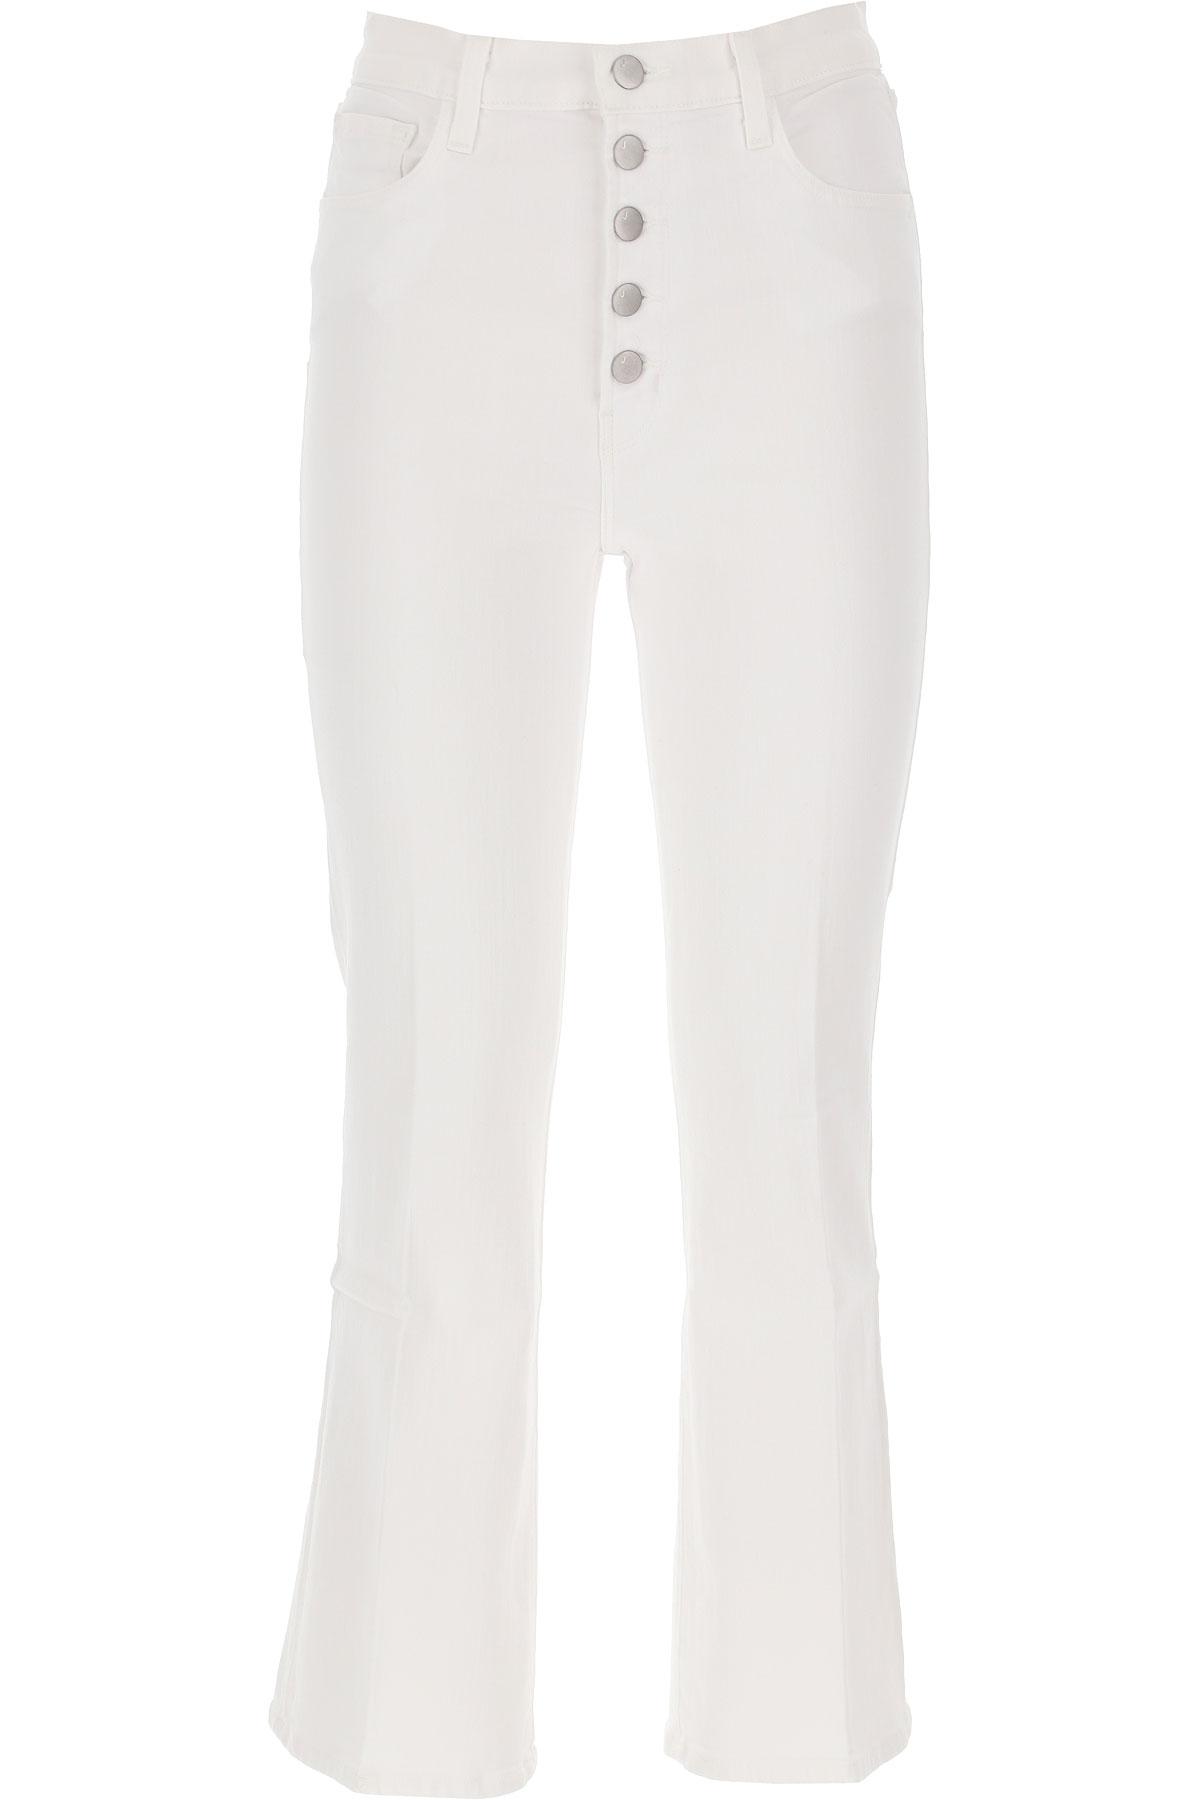 J Brand Jeans On Sale, White, Cotton, 2019, 24 25 26 27 28 29